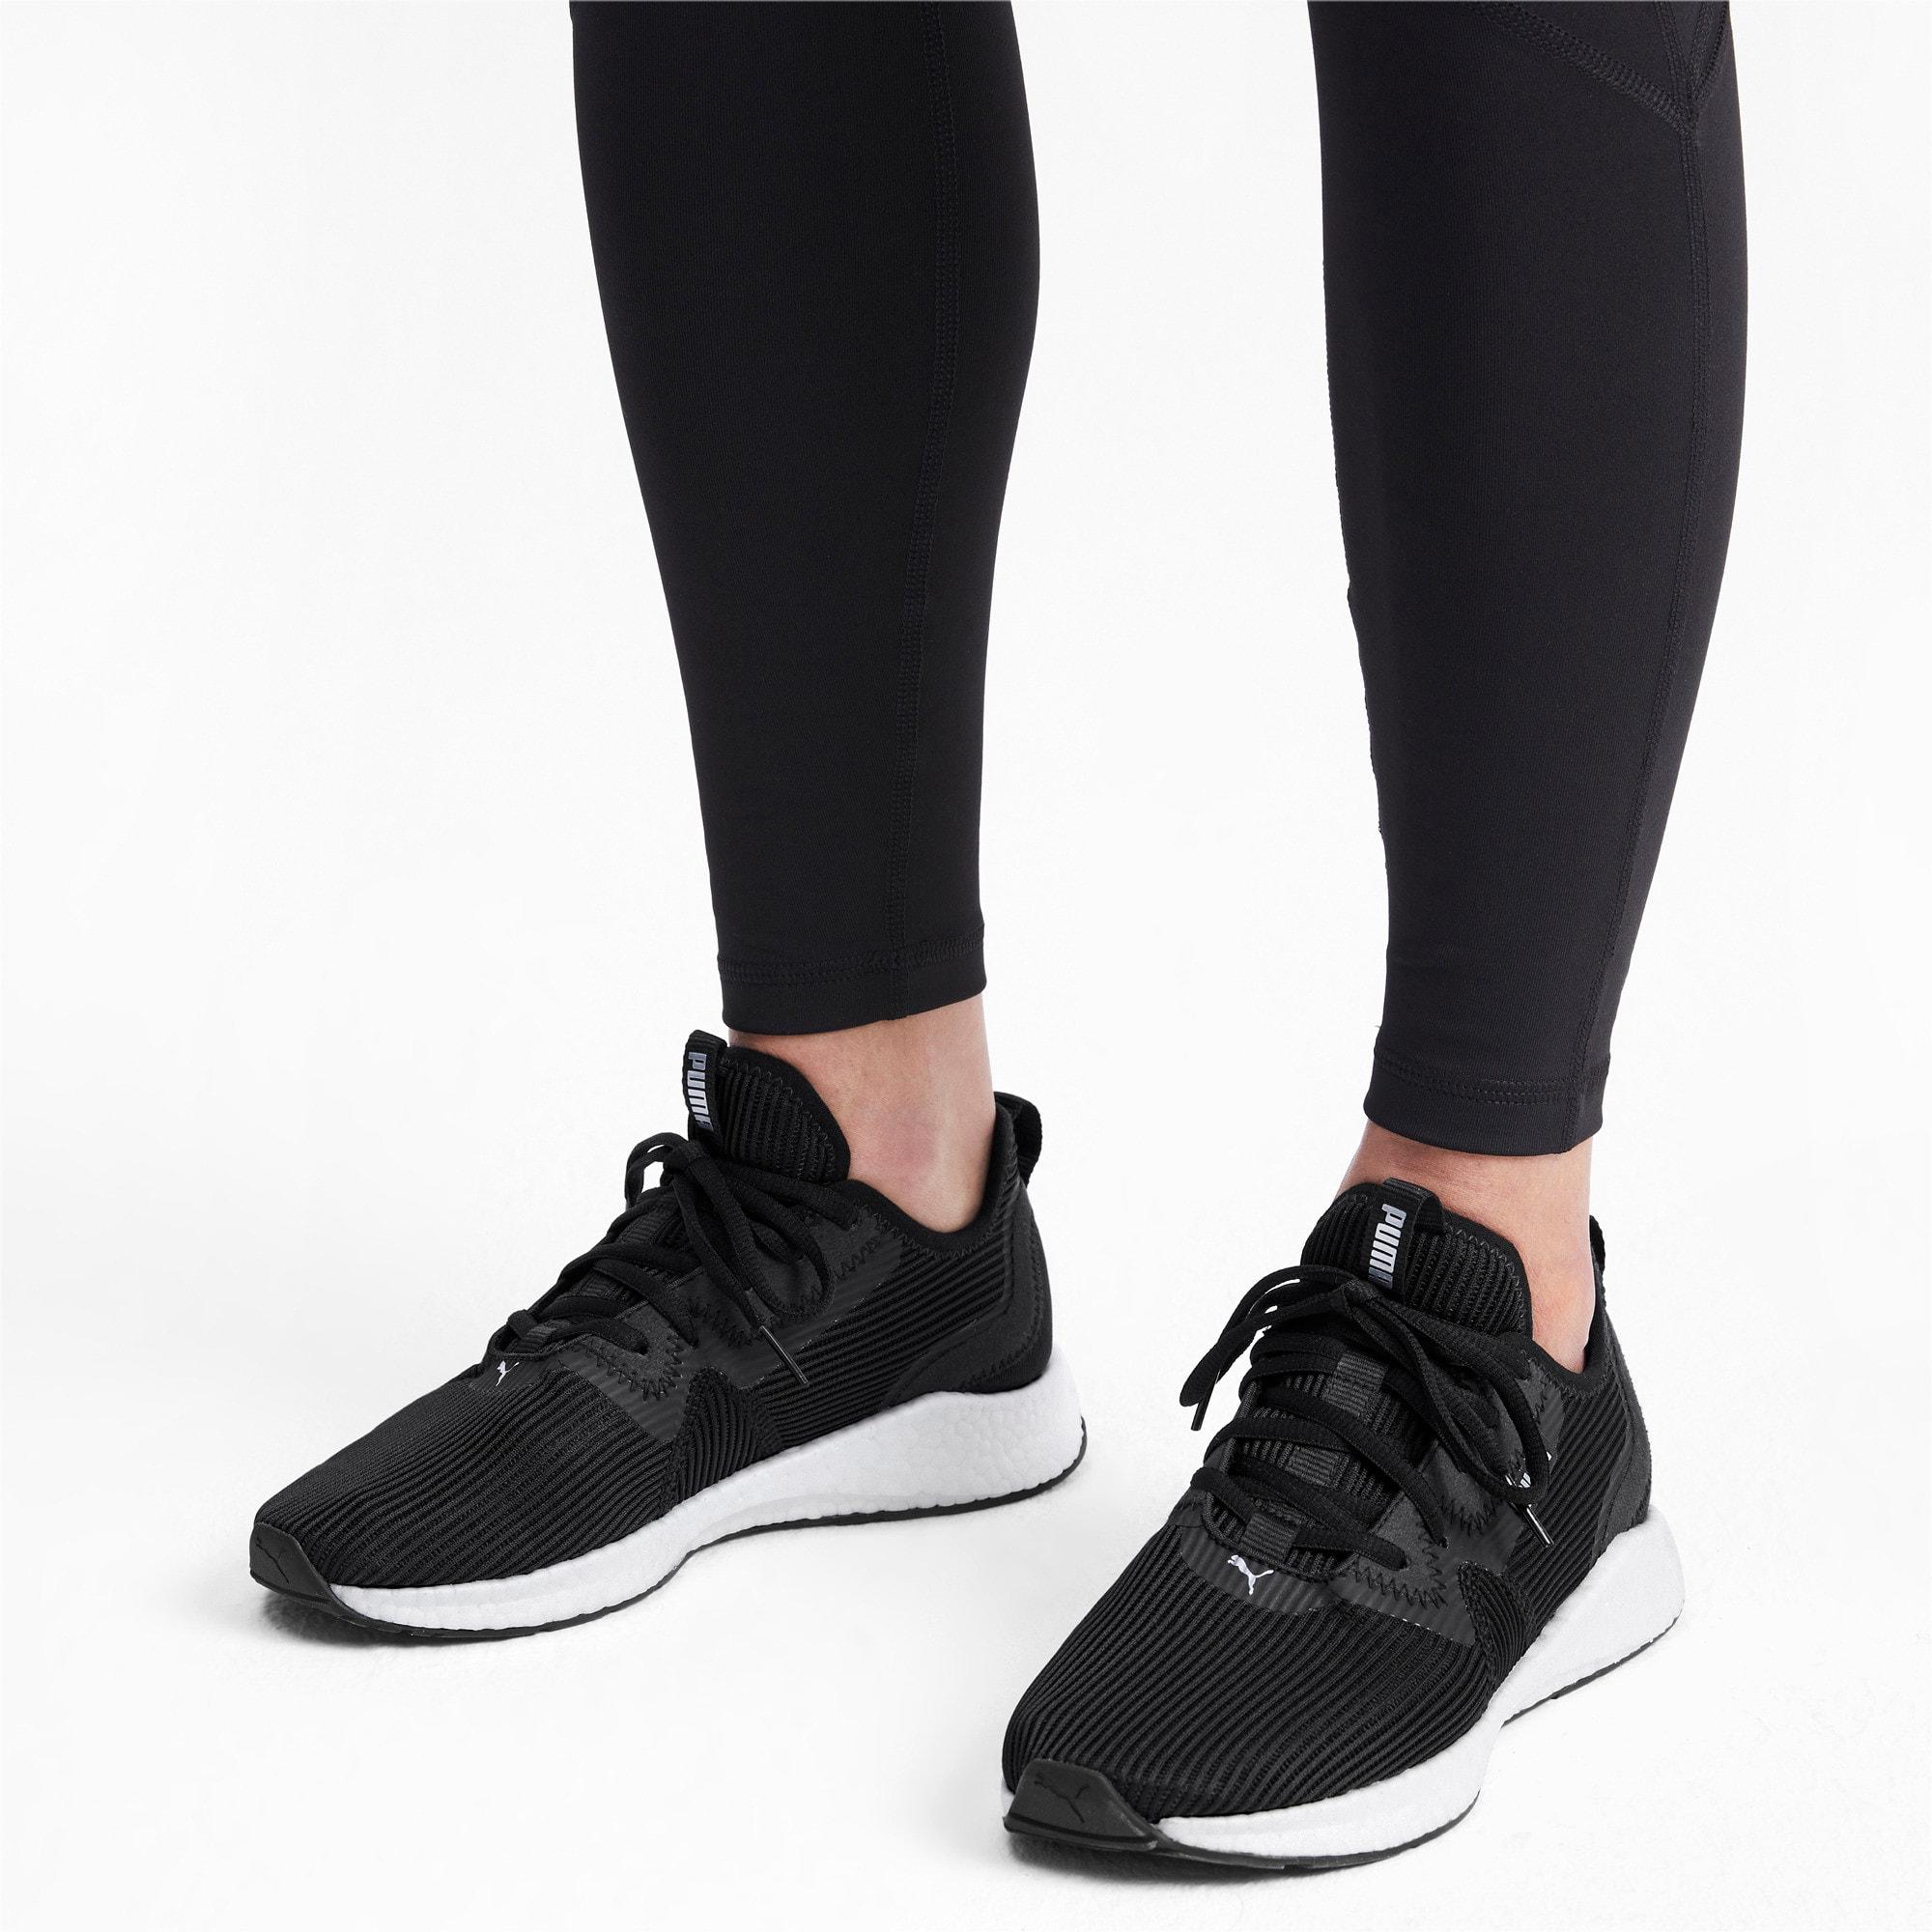 Thumbnail 2 of NRGY Star Femme Women's Running Shoes, Black-Silver-White, medium-IND